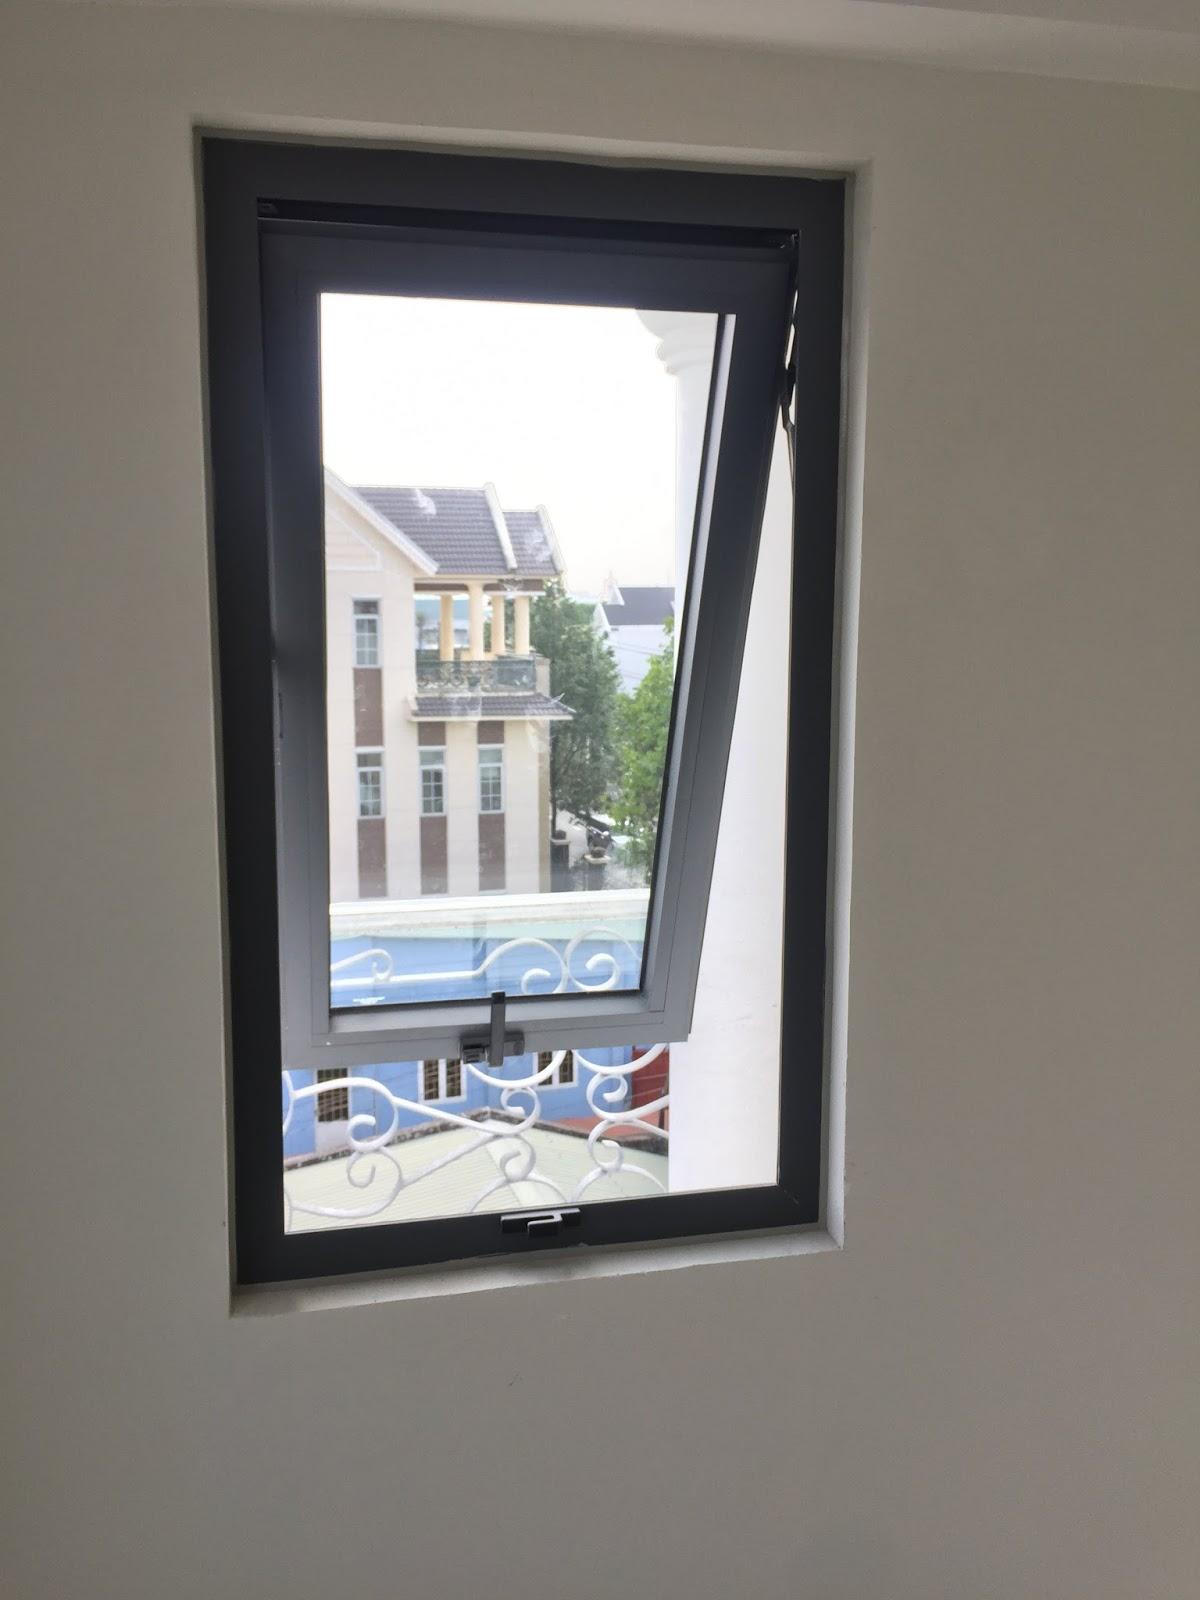 Mẫu cửa sổ 1 cánh đẹp